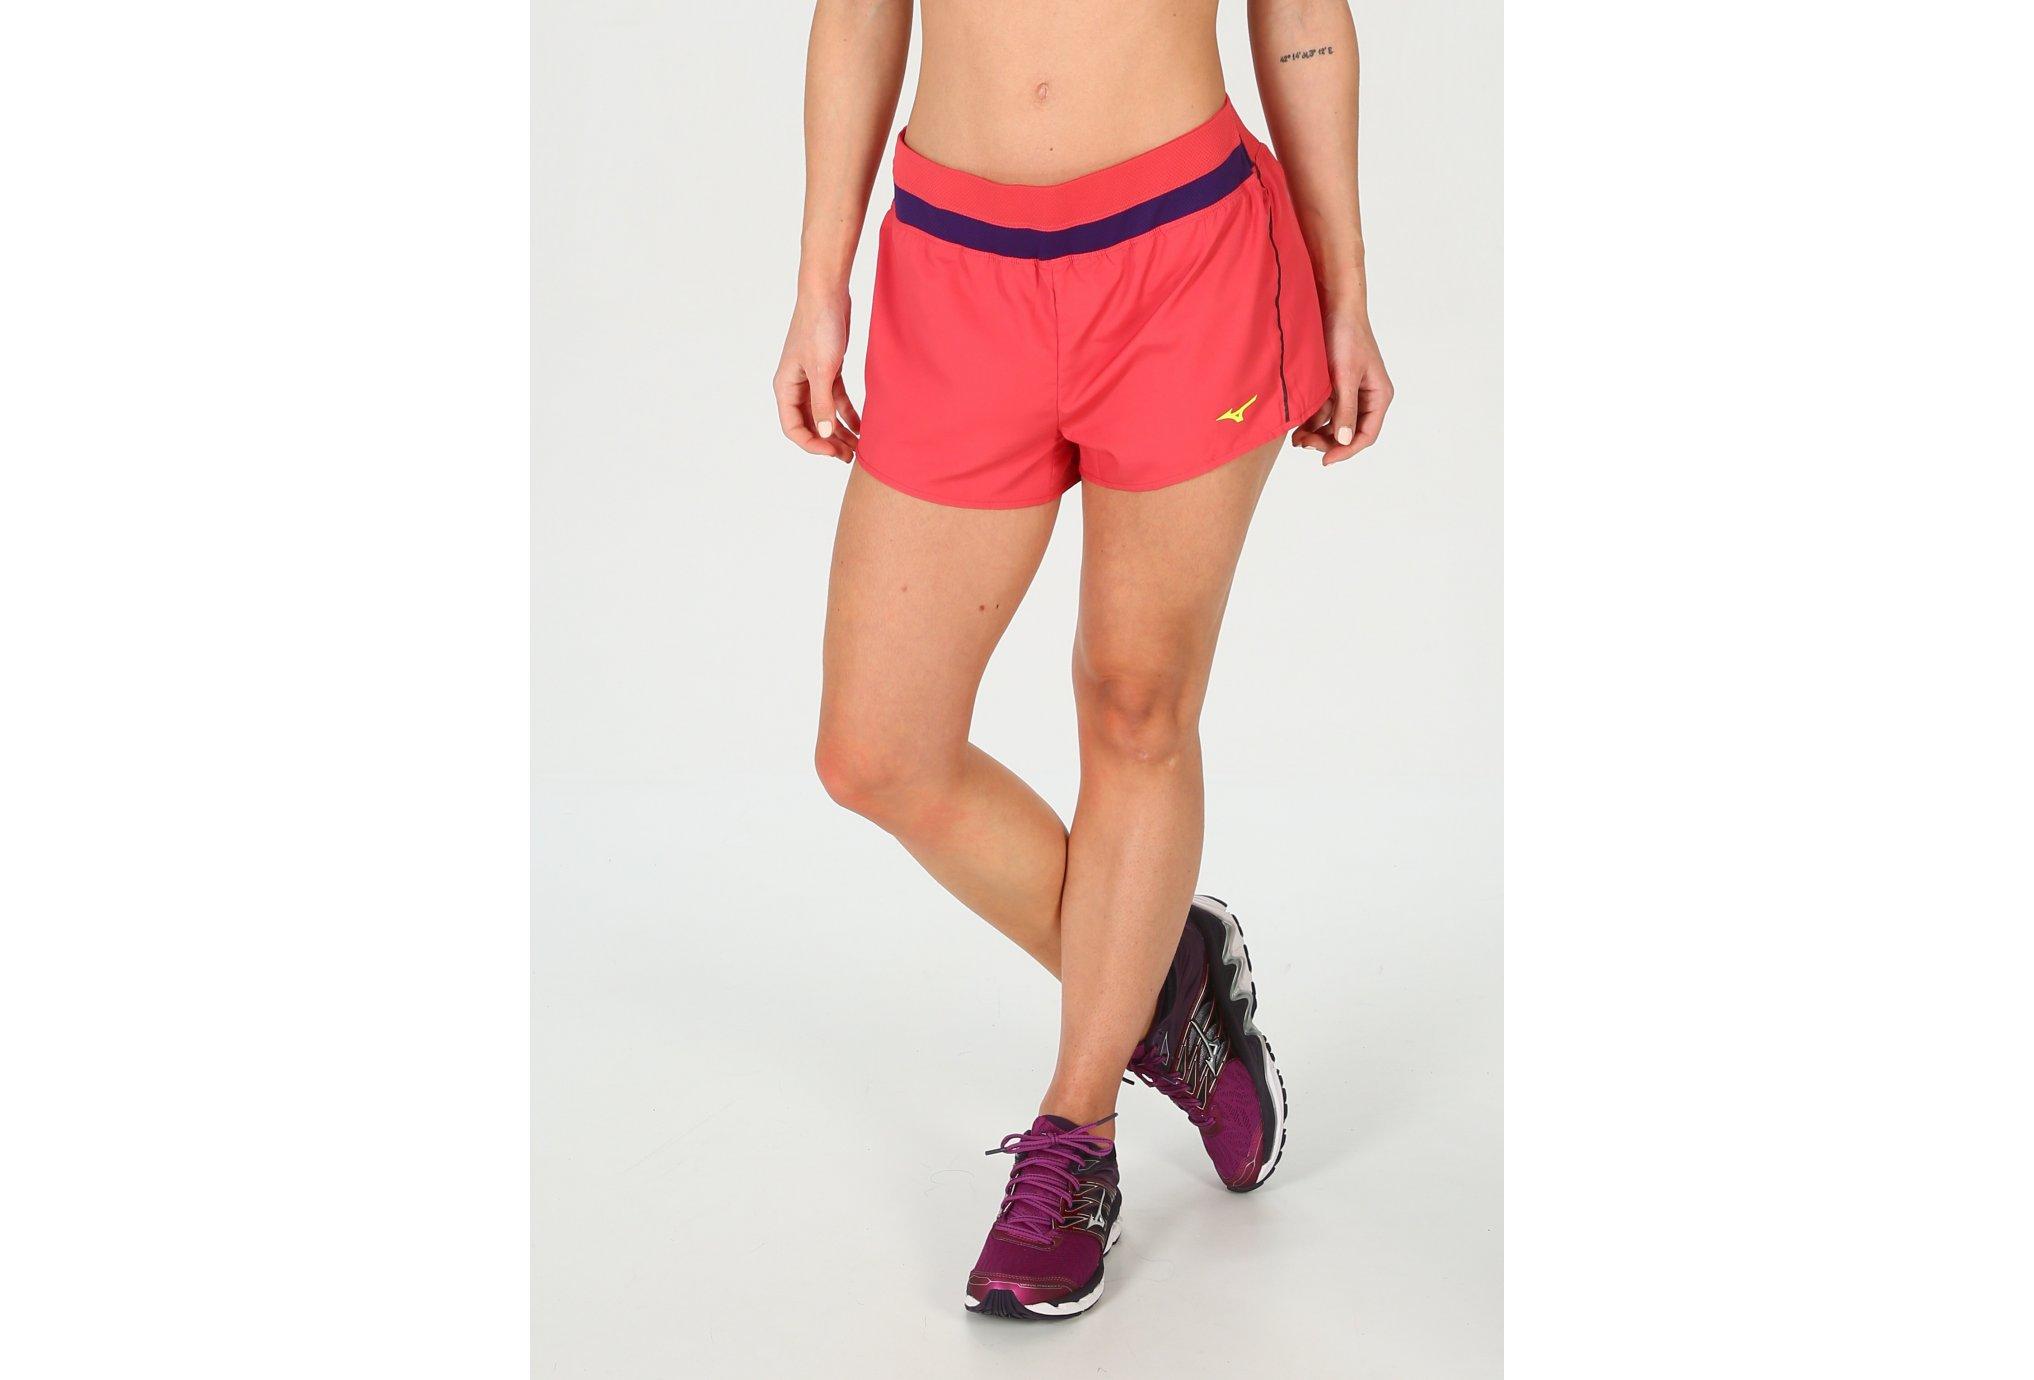 Mizuno Short Helix Square 2.5 W vêtement running femme